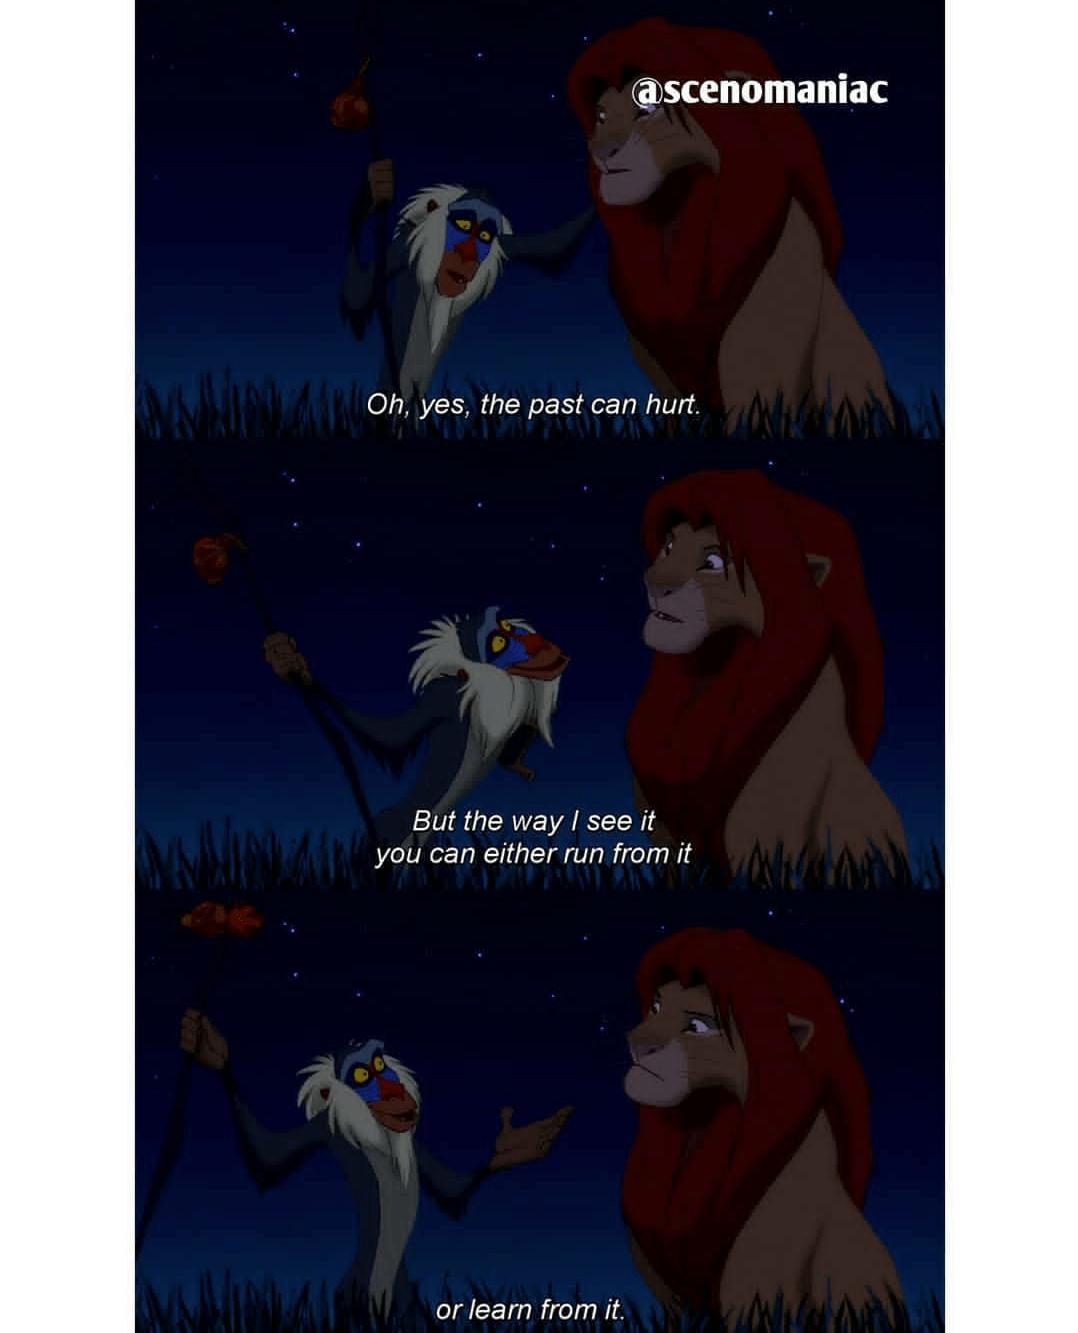 [Image] Rafiki's wisdom.